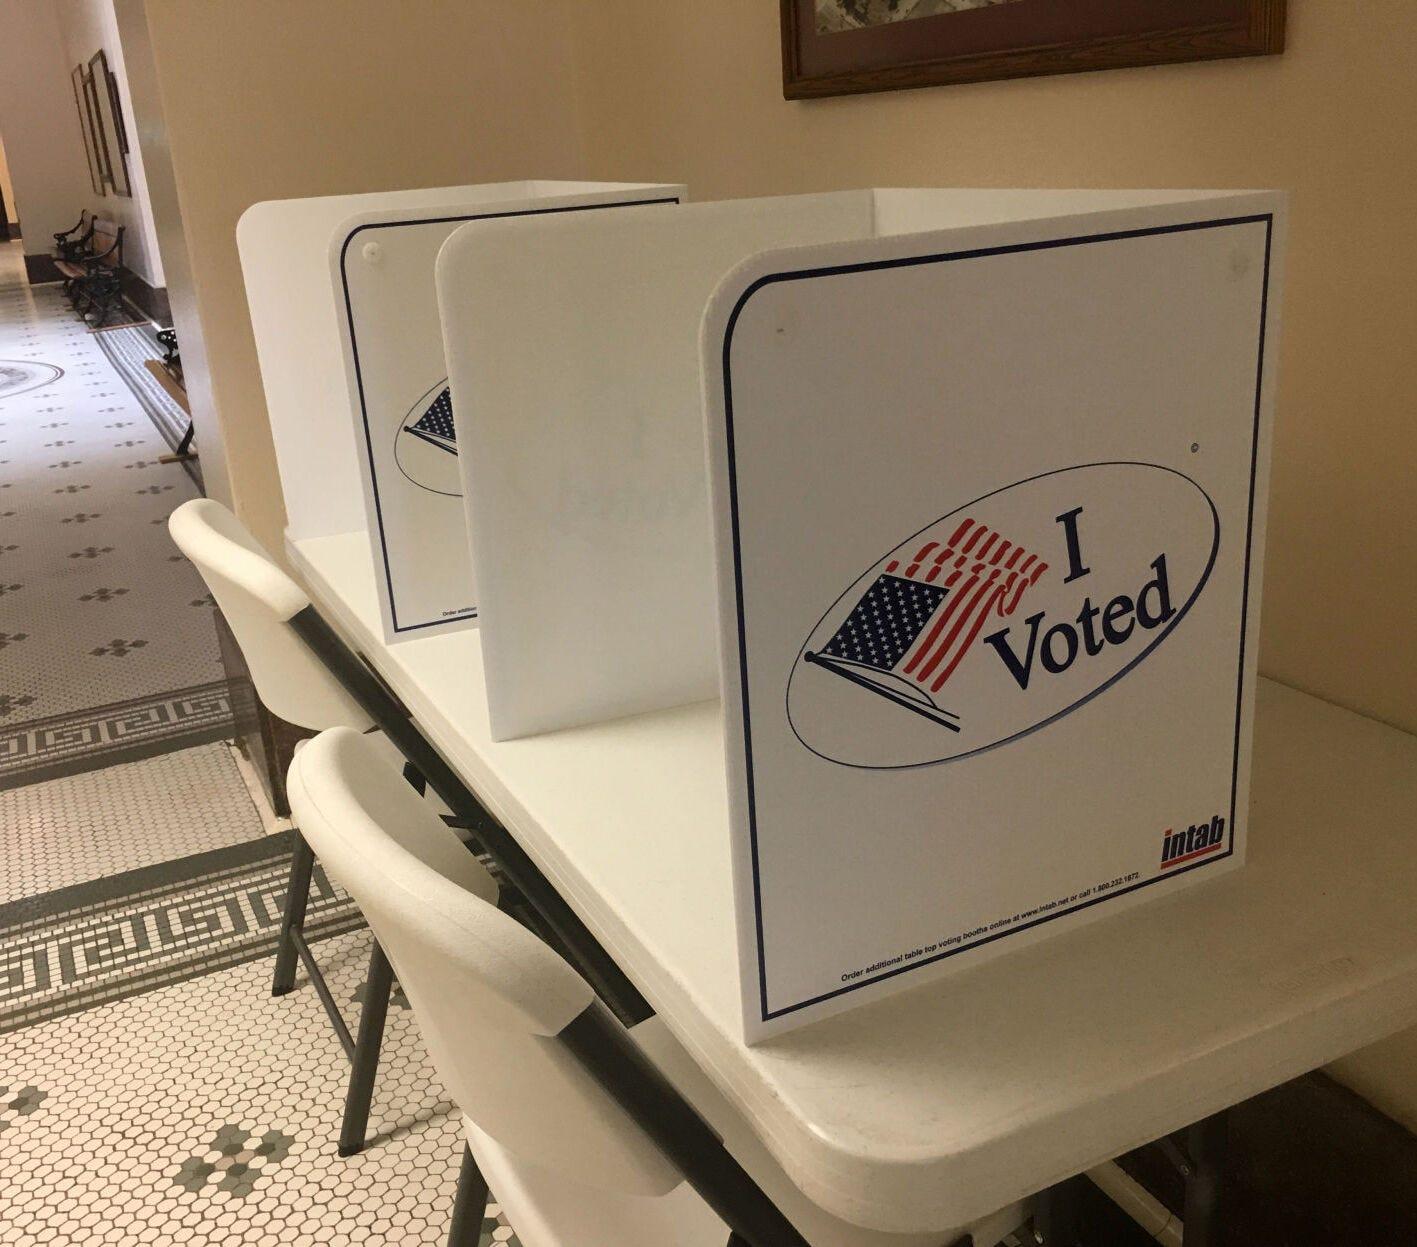 Do you plan to vote Tuesday?